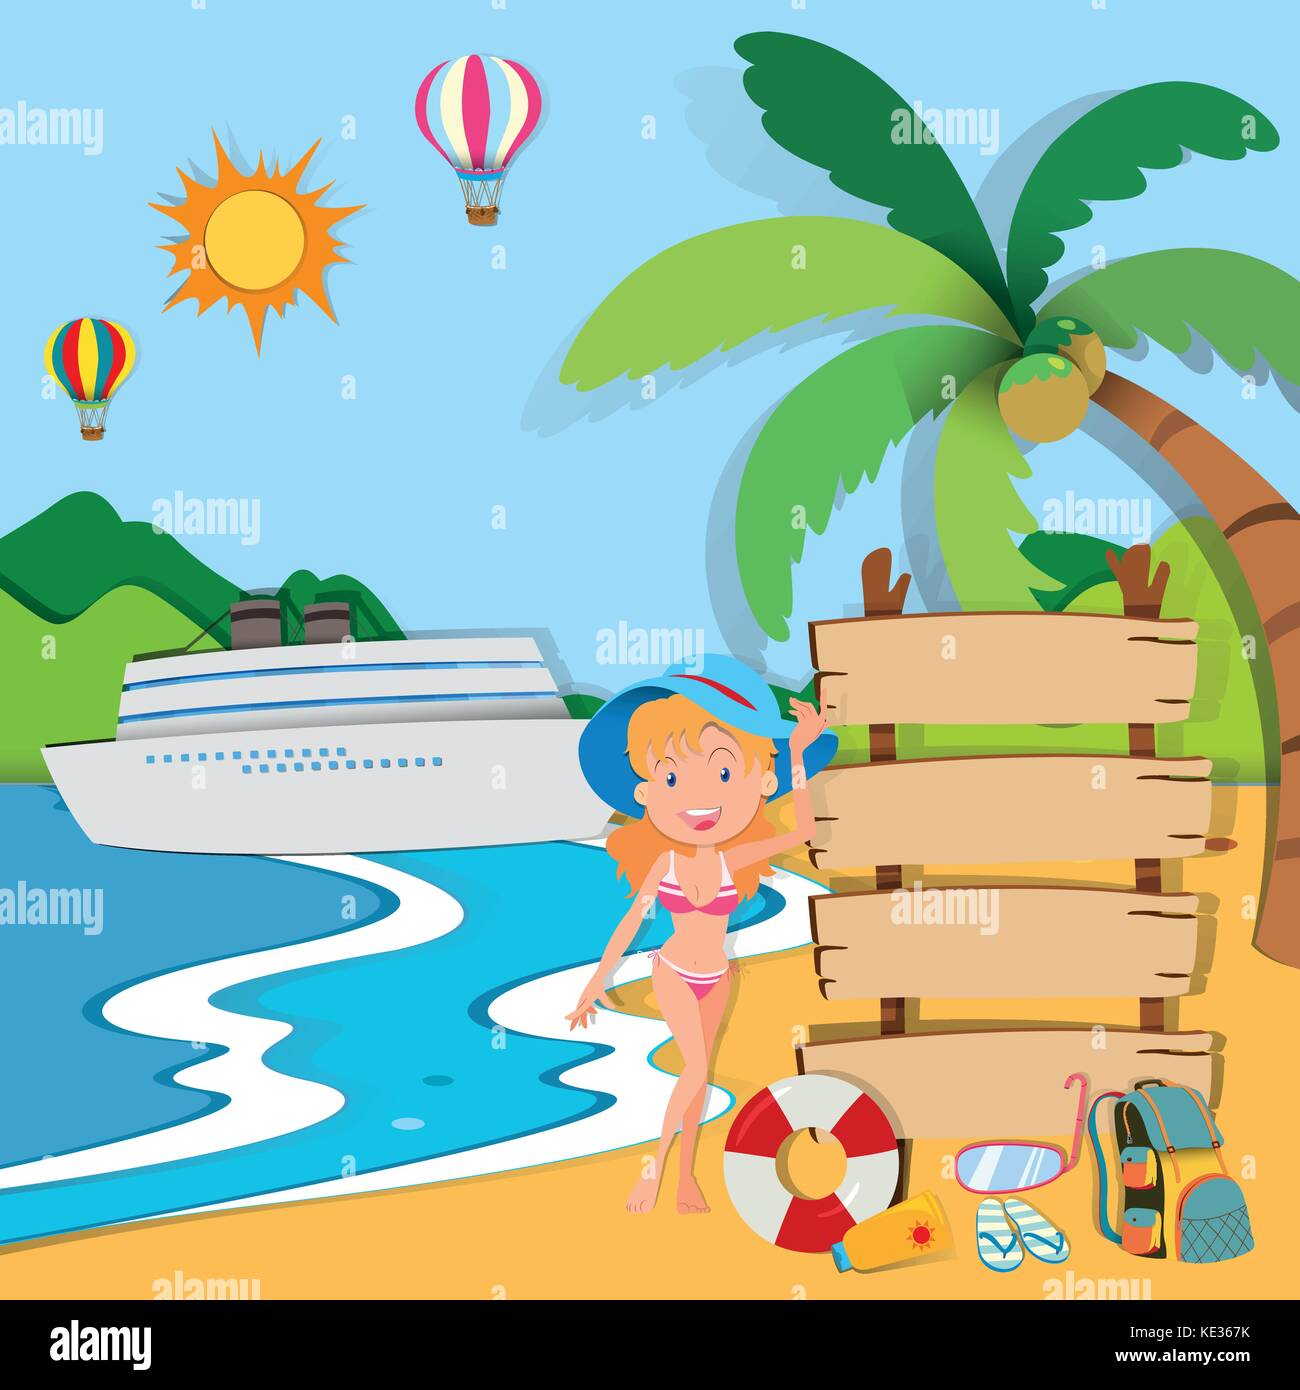 Woman in bikini on the beach illustration - Stock Vector